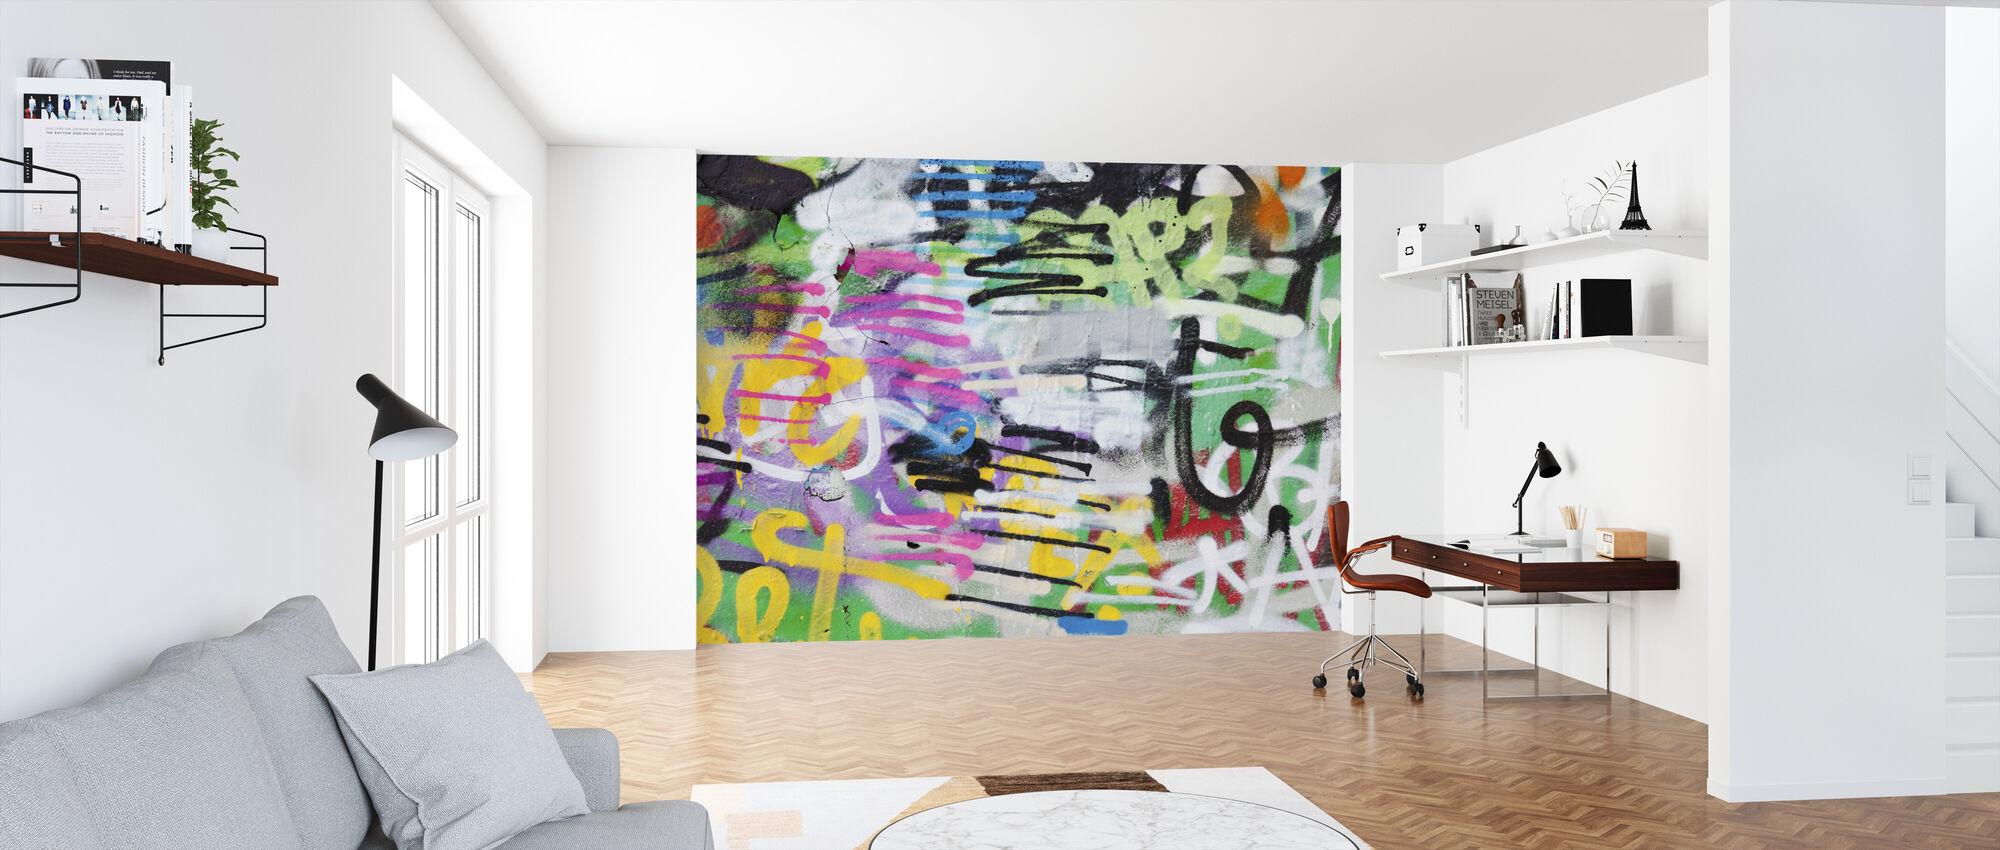 Painted Graffiti Wall - Wallpaper - Office